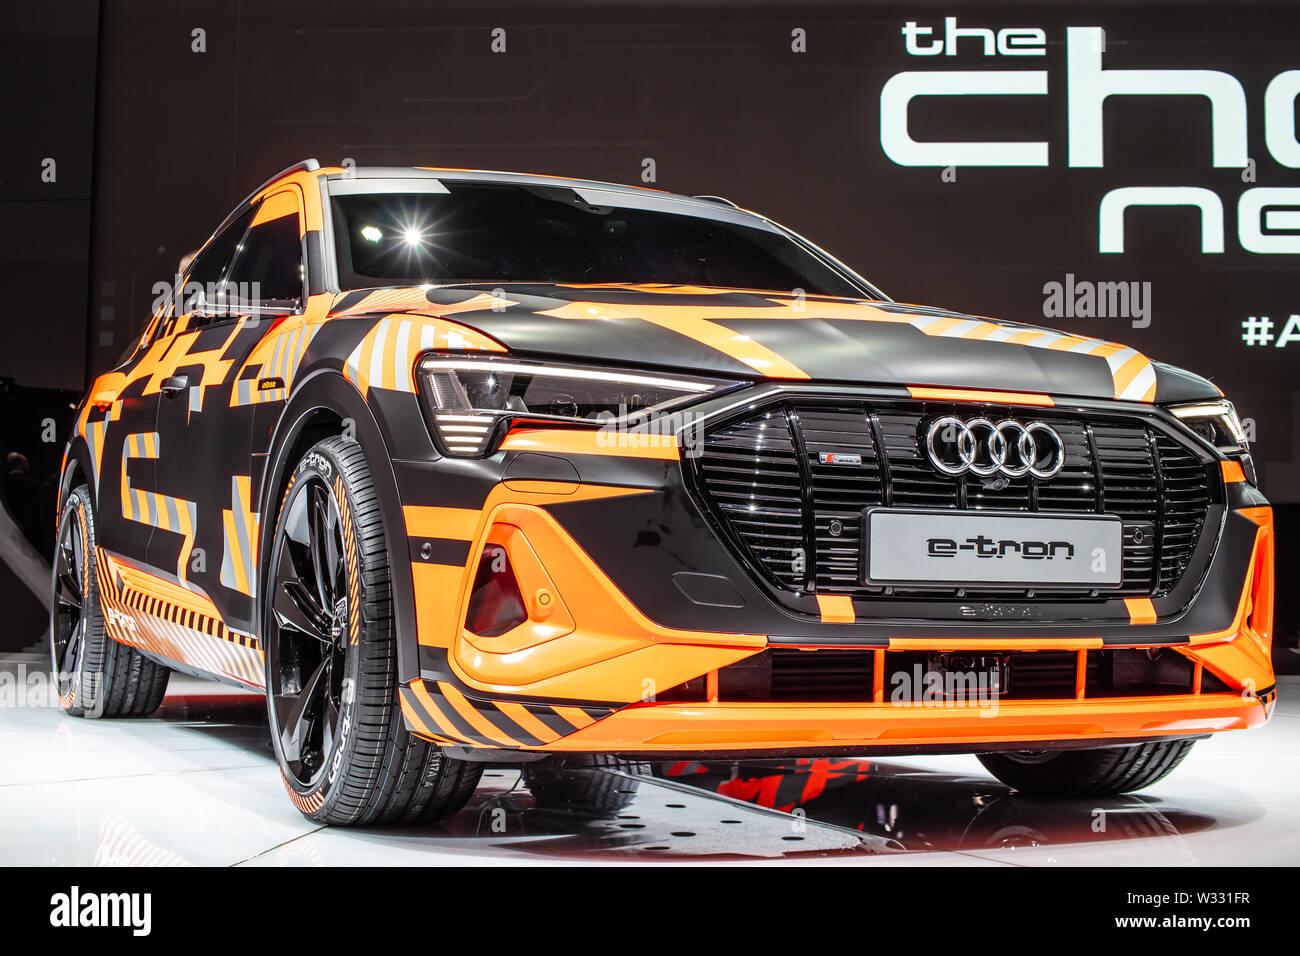 Geneva Mar 2019 New All Electric Audi E Tron Sportback Concept Prototype Car Coupe Like Crossover Geneva International Motor Show Stock Photo Alamy